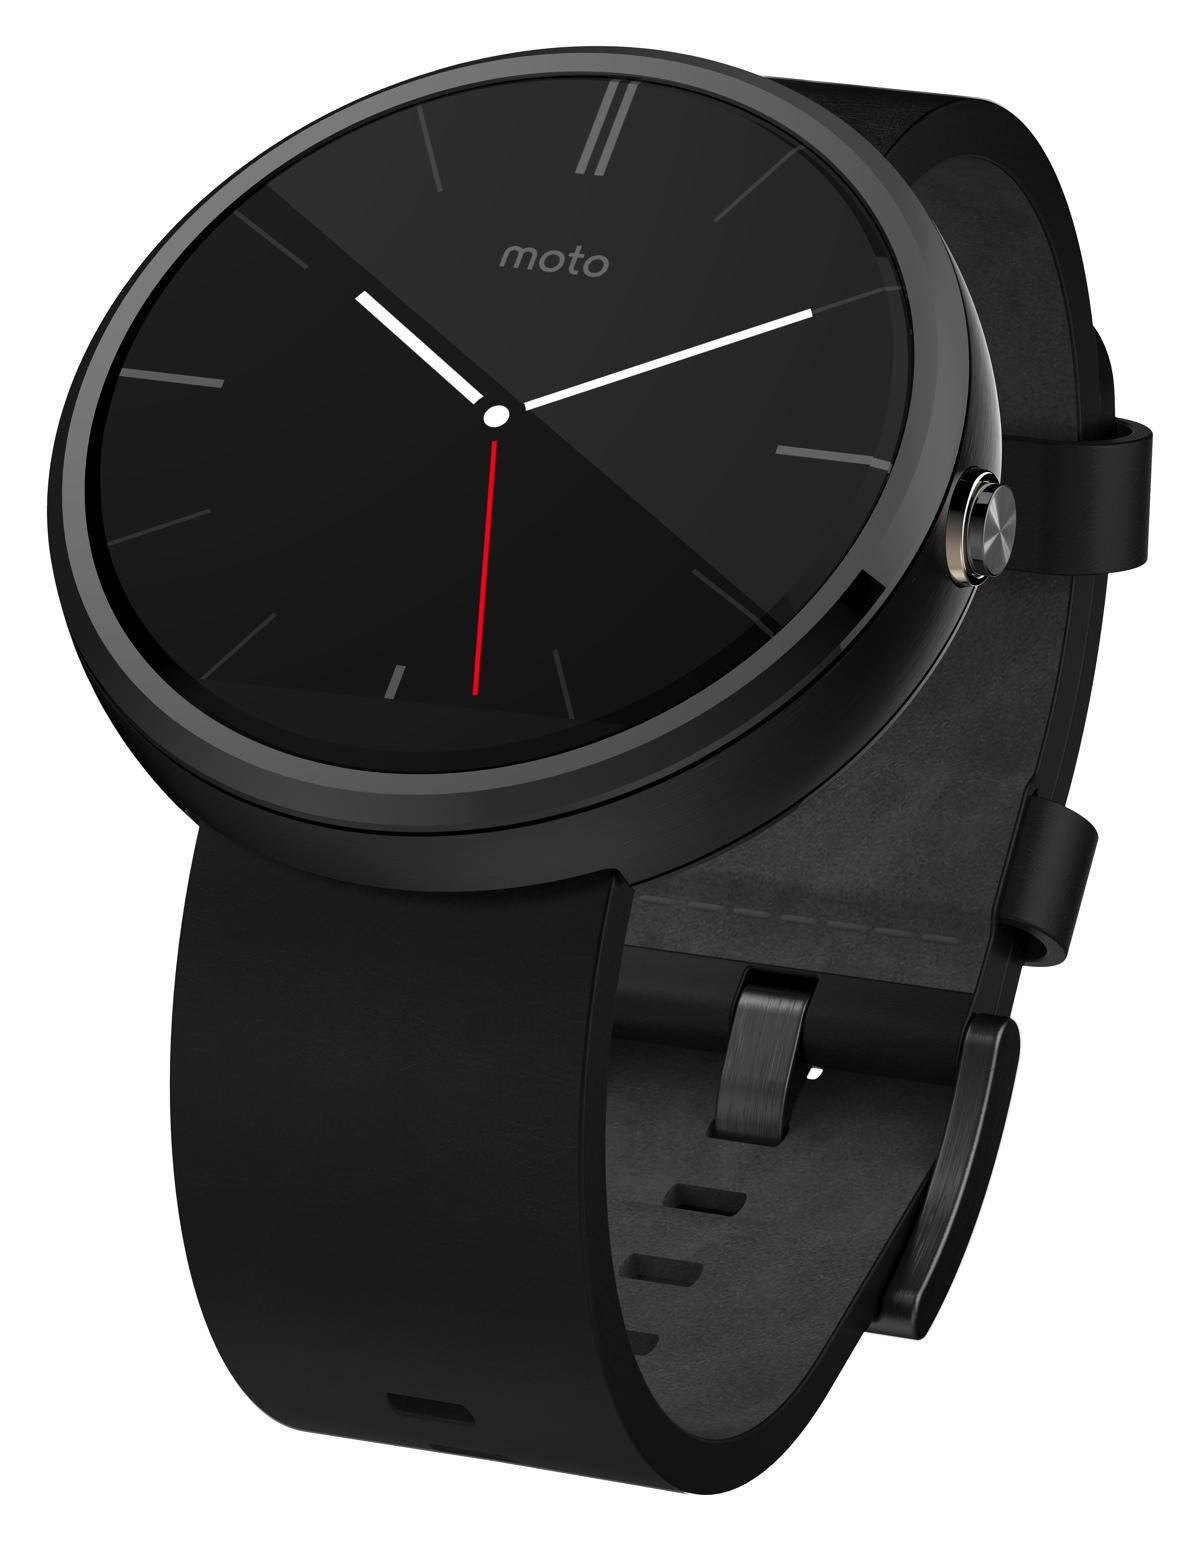 moto-360-smartwatch-1